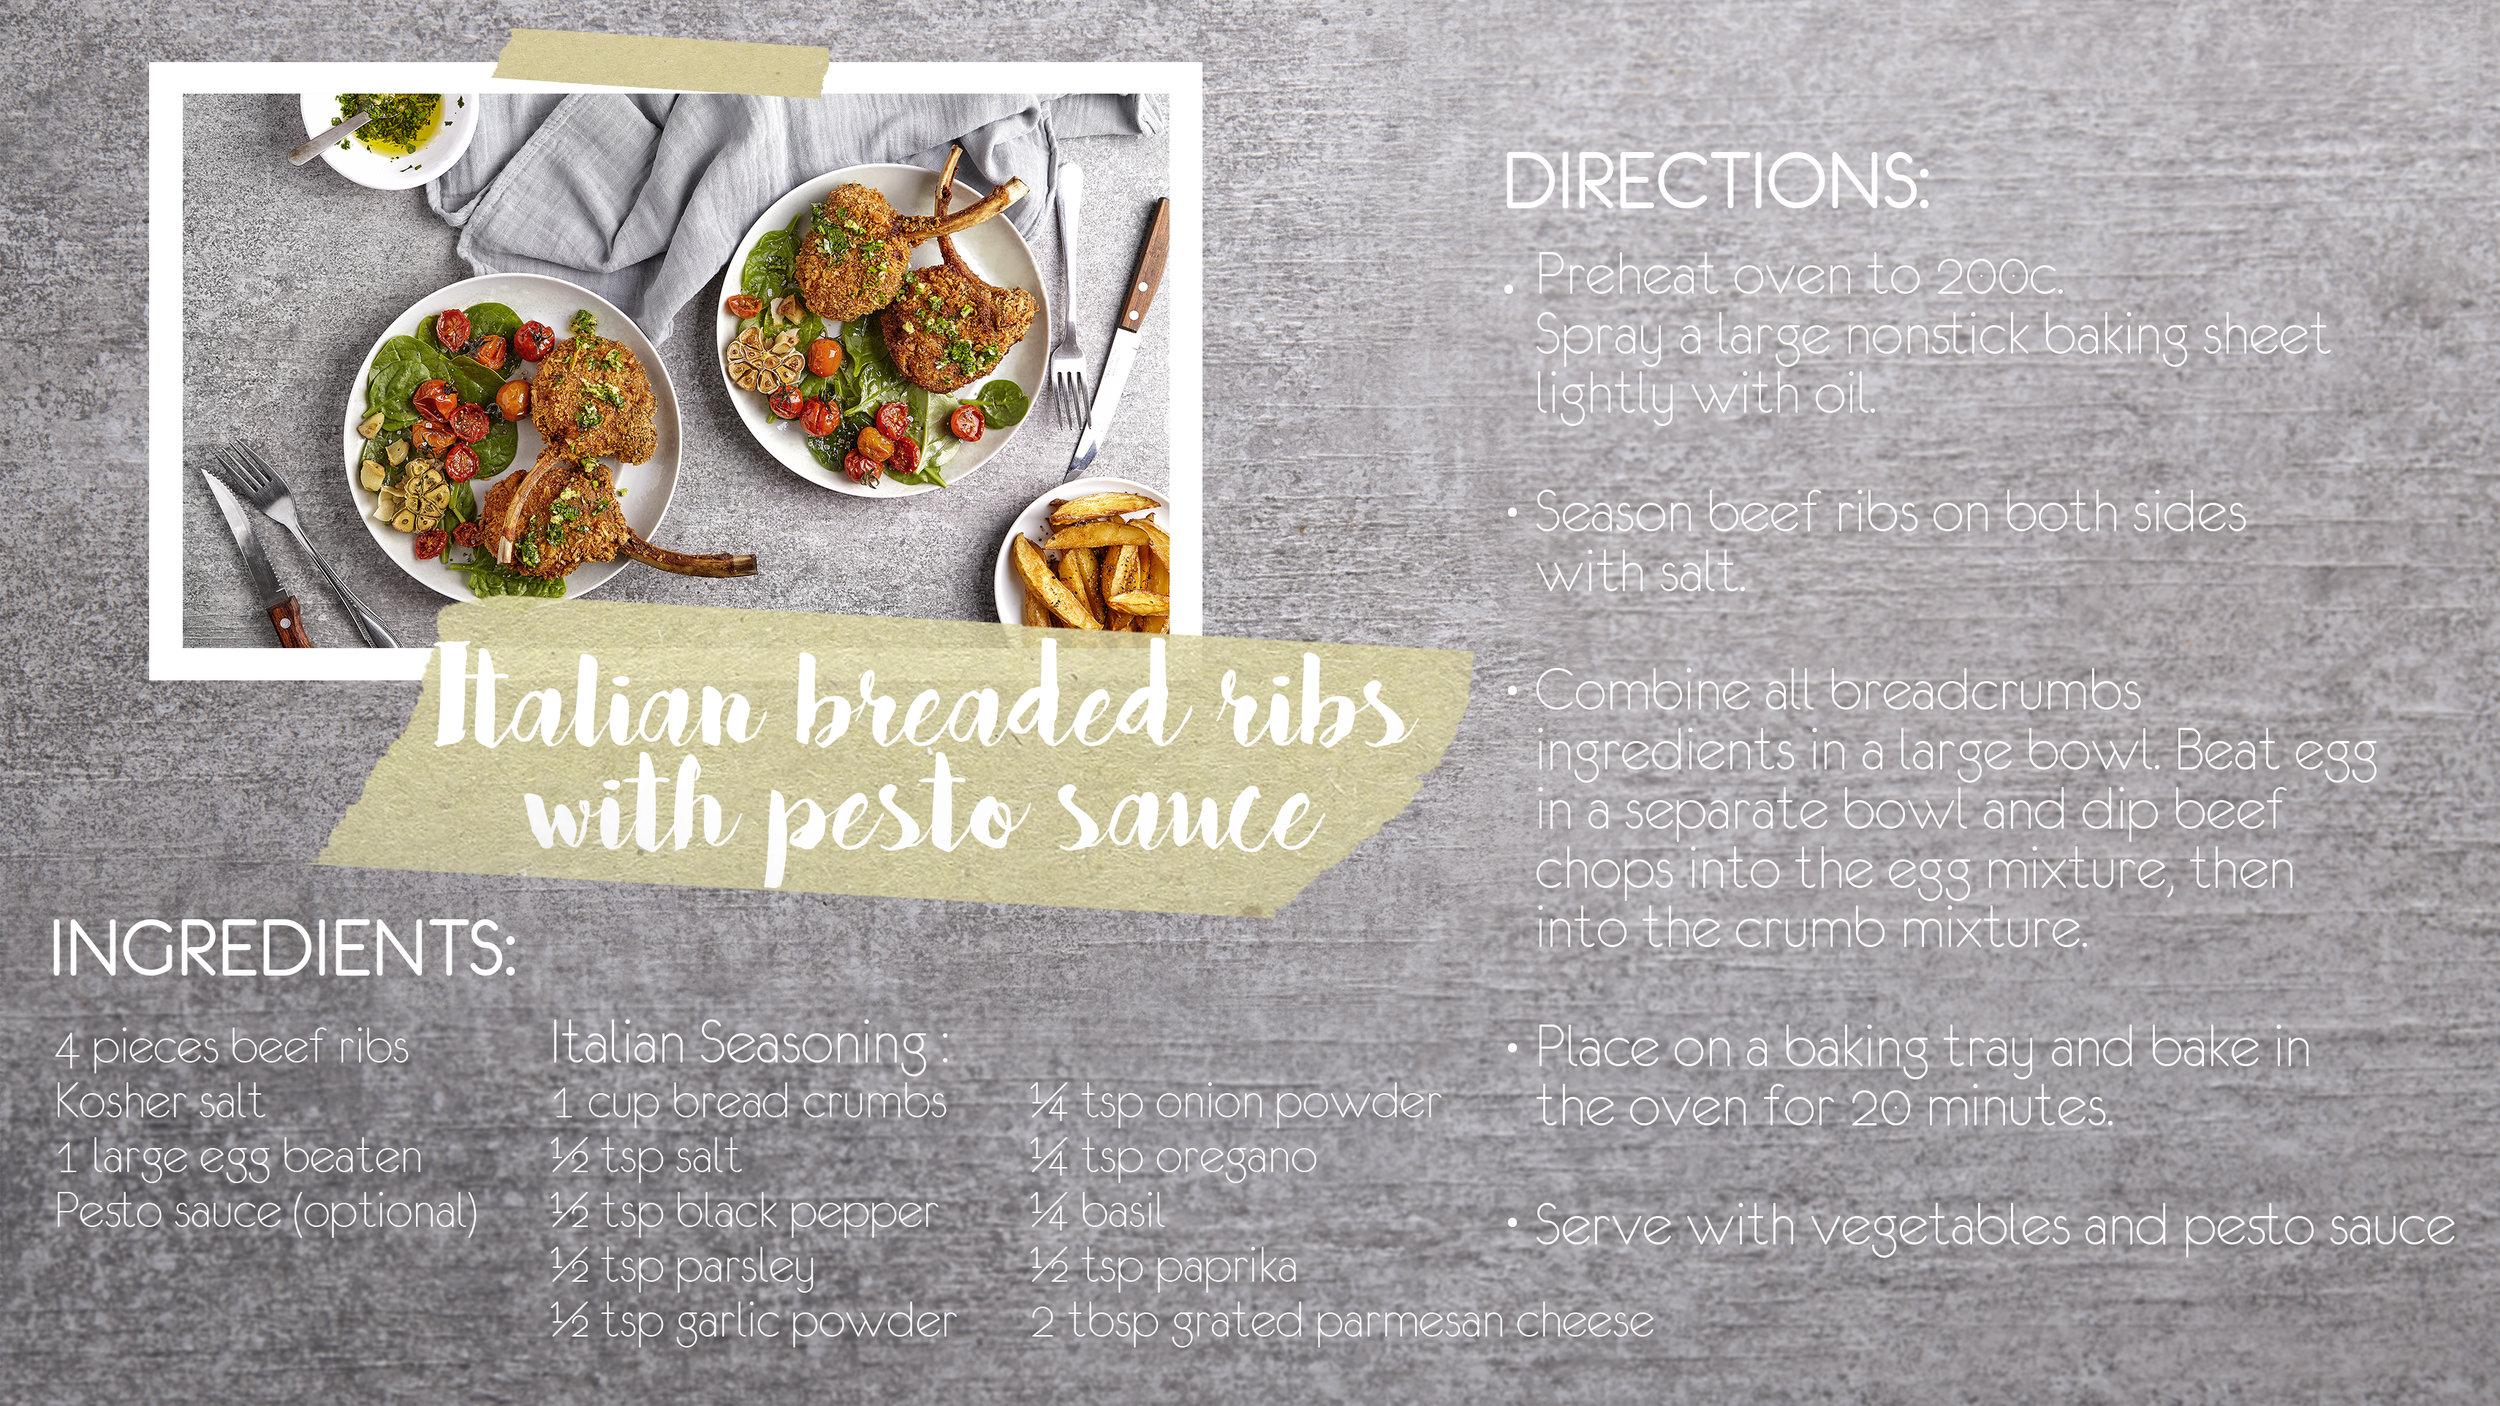 Full recipe below: